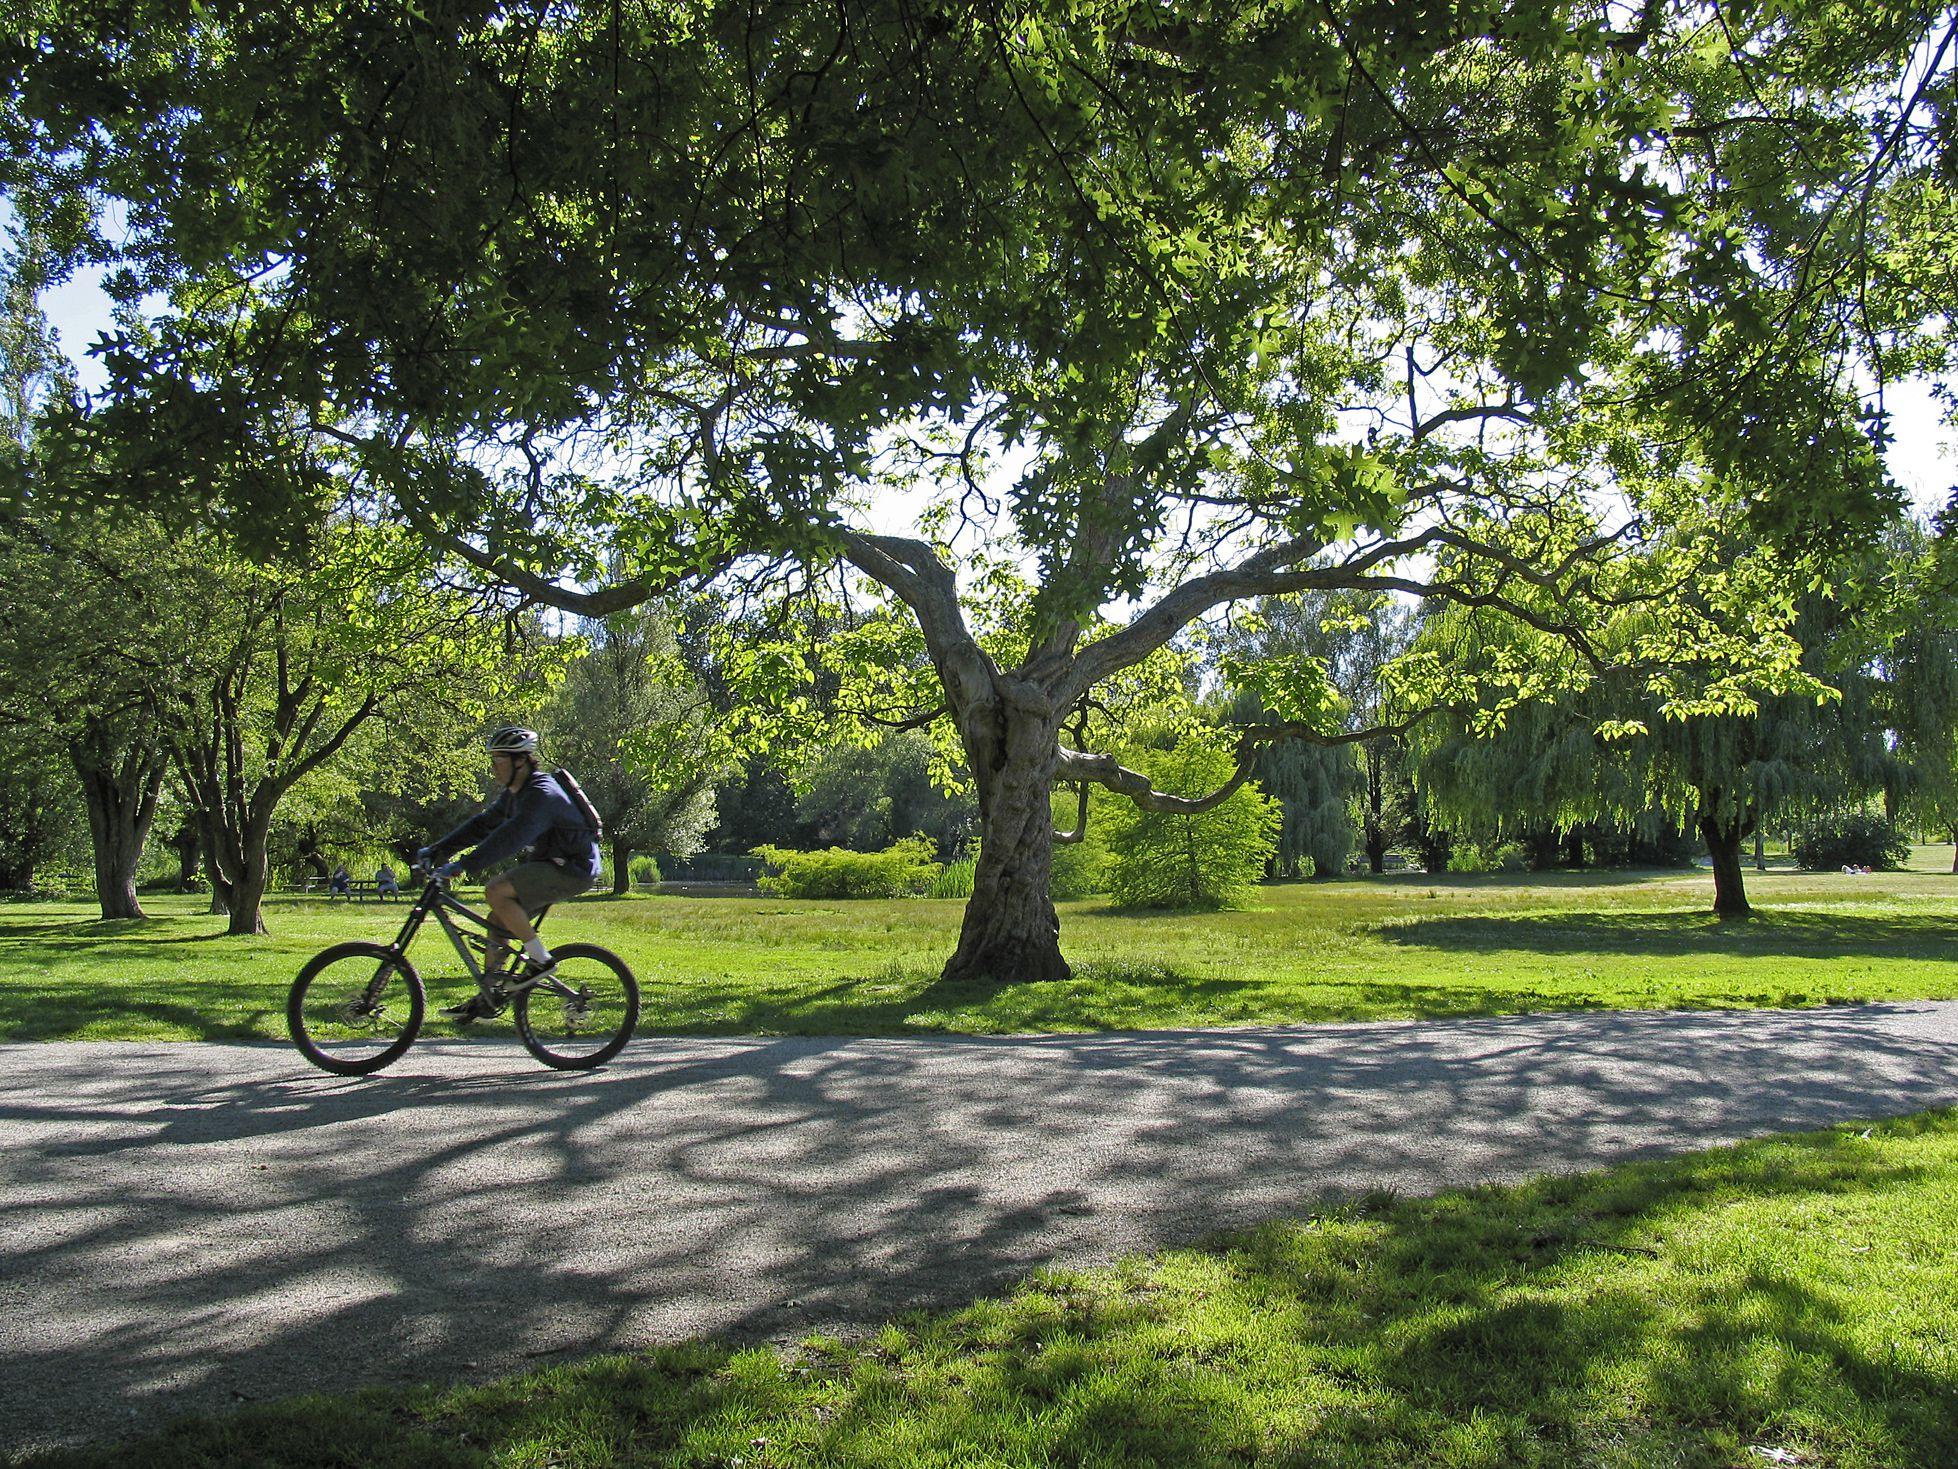 A cyclist rides through Jericho Park